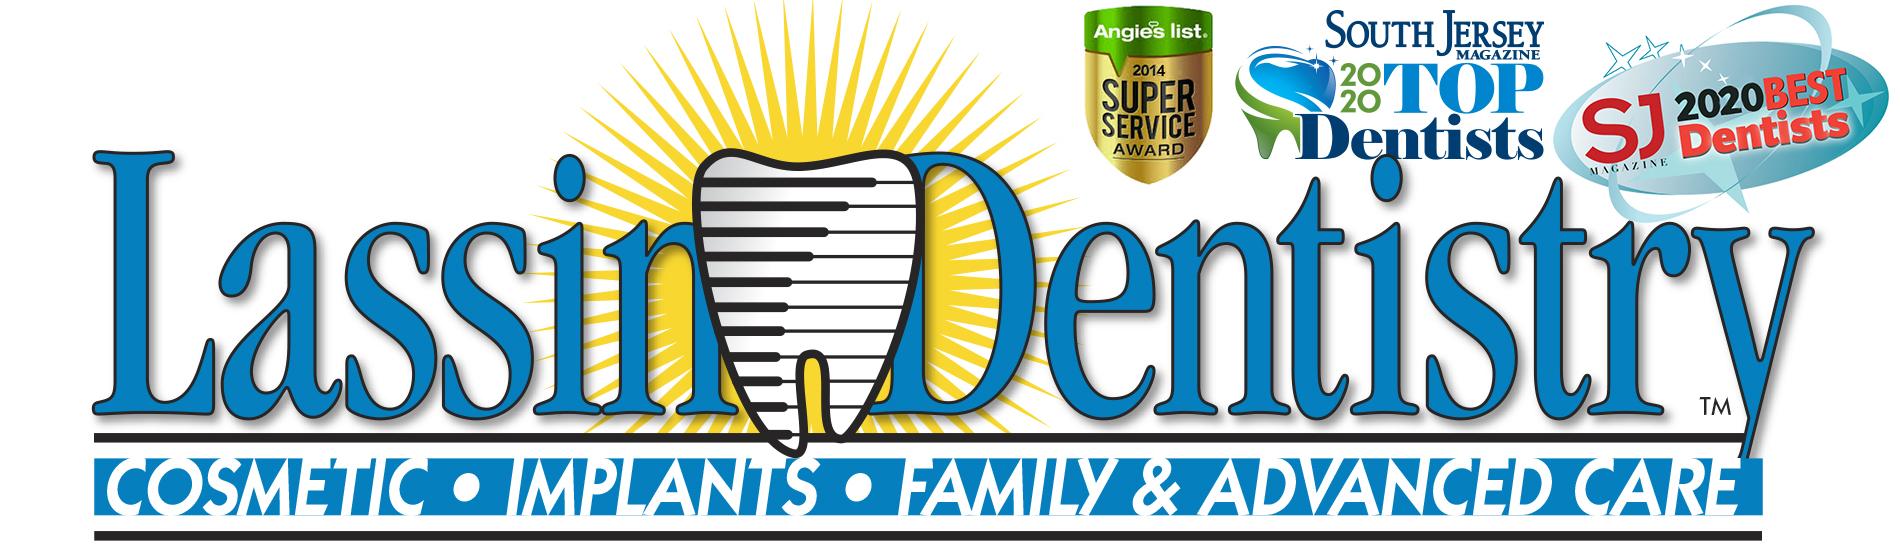 Lassin Dentistry Web-Slide #4